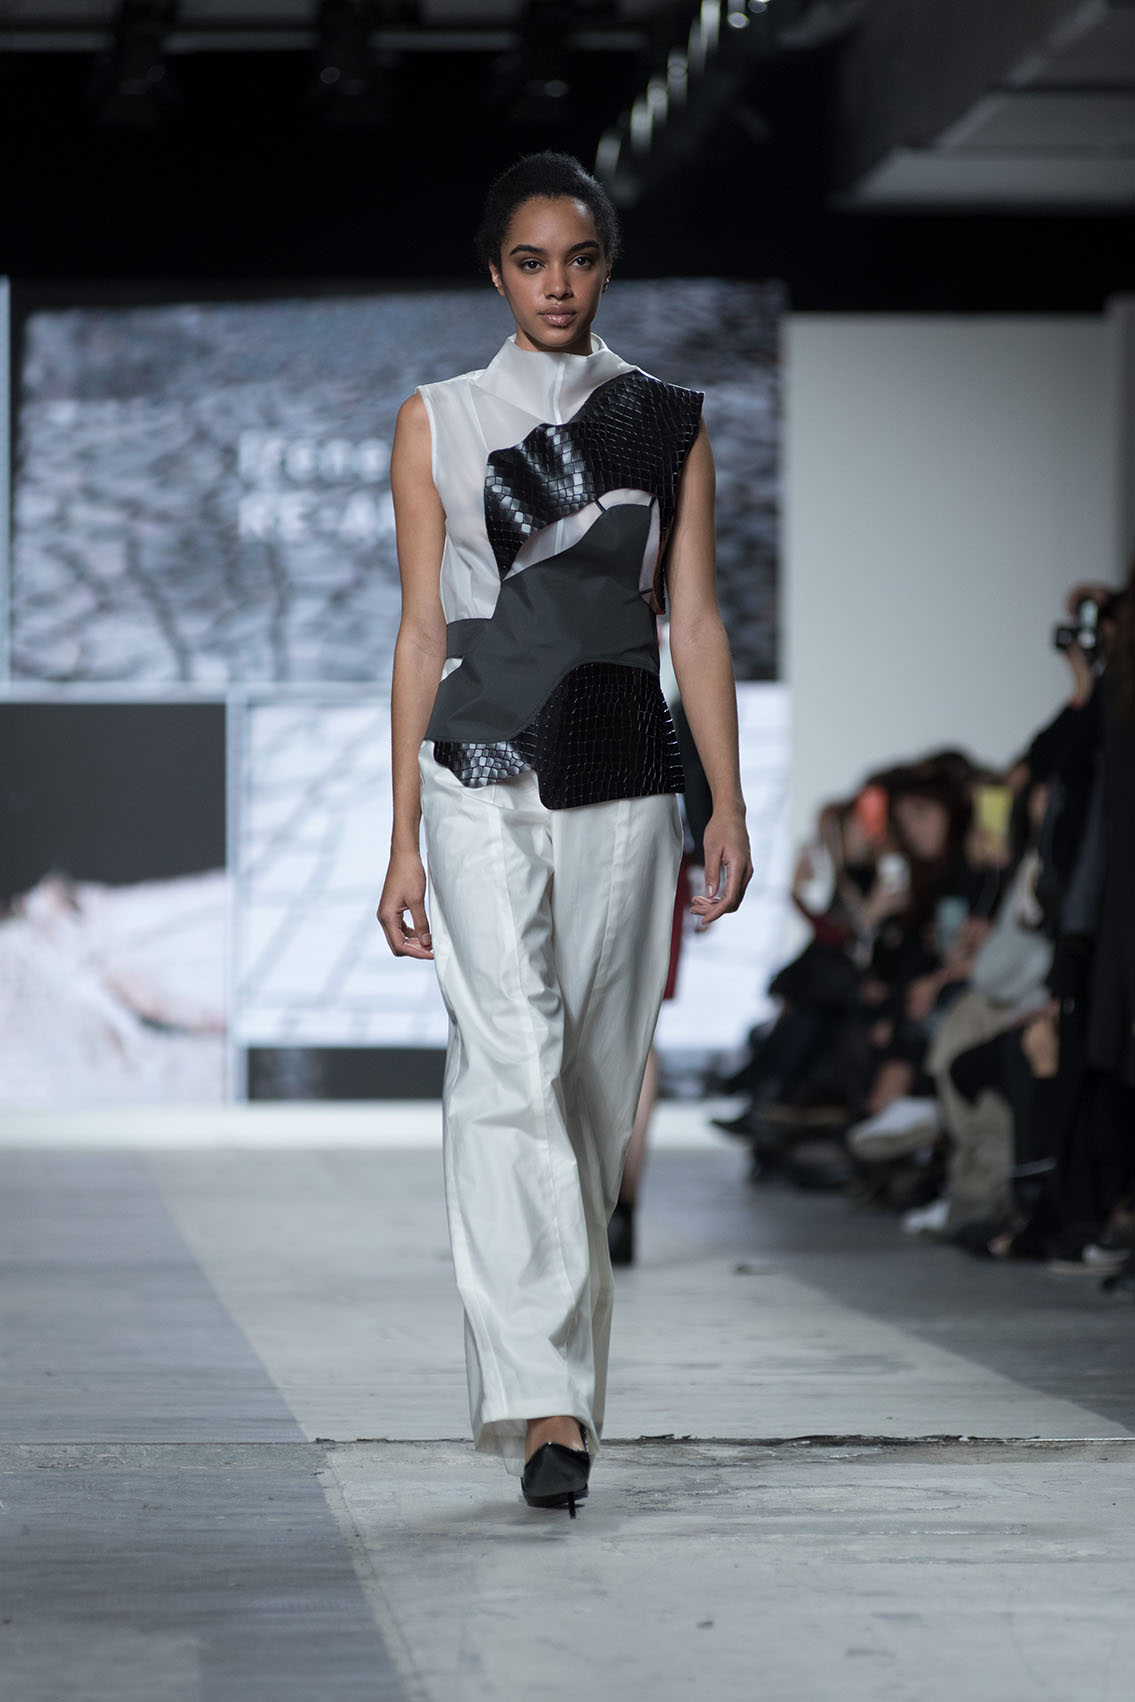 Fashion Designer: Irene Incontri - Fashion Graduate Italia Fashion Show - Istituto Secoli